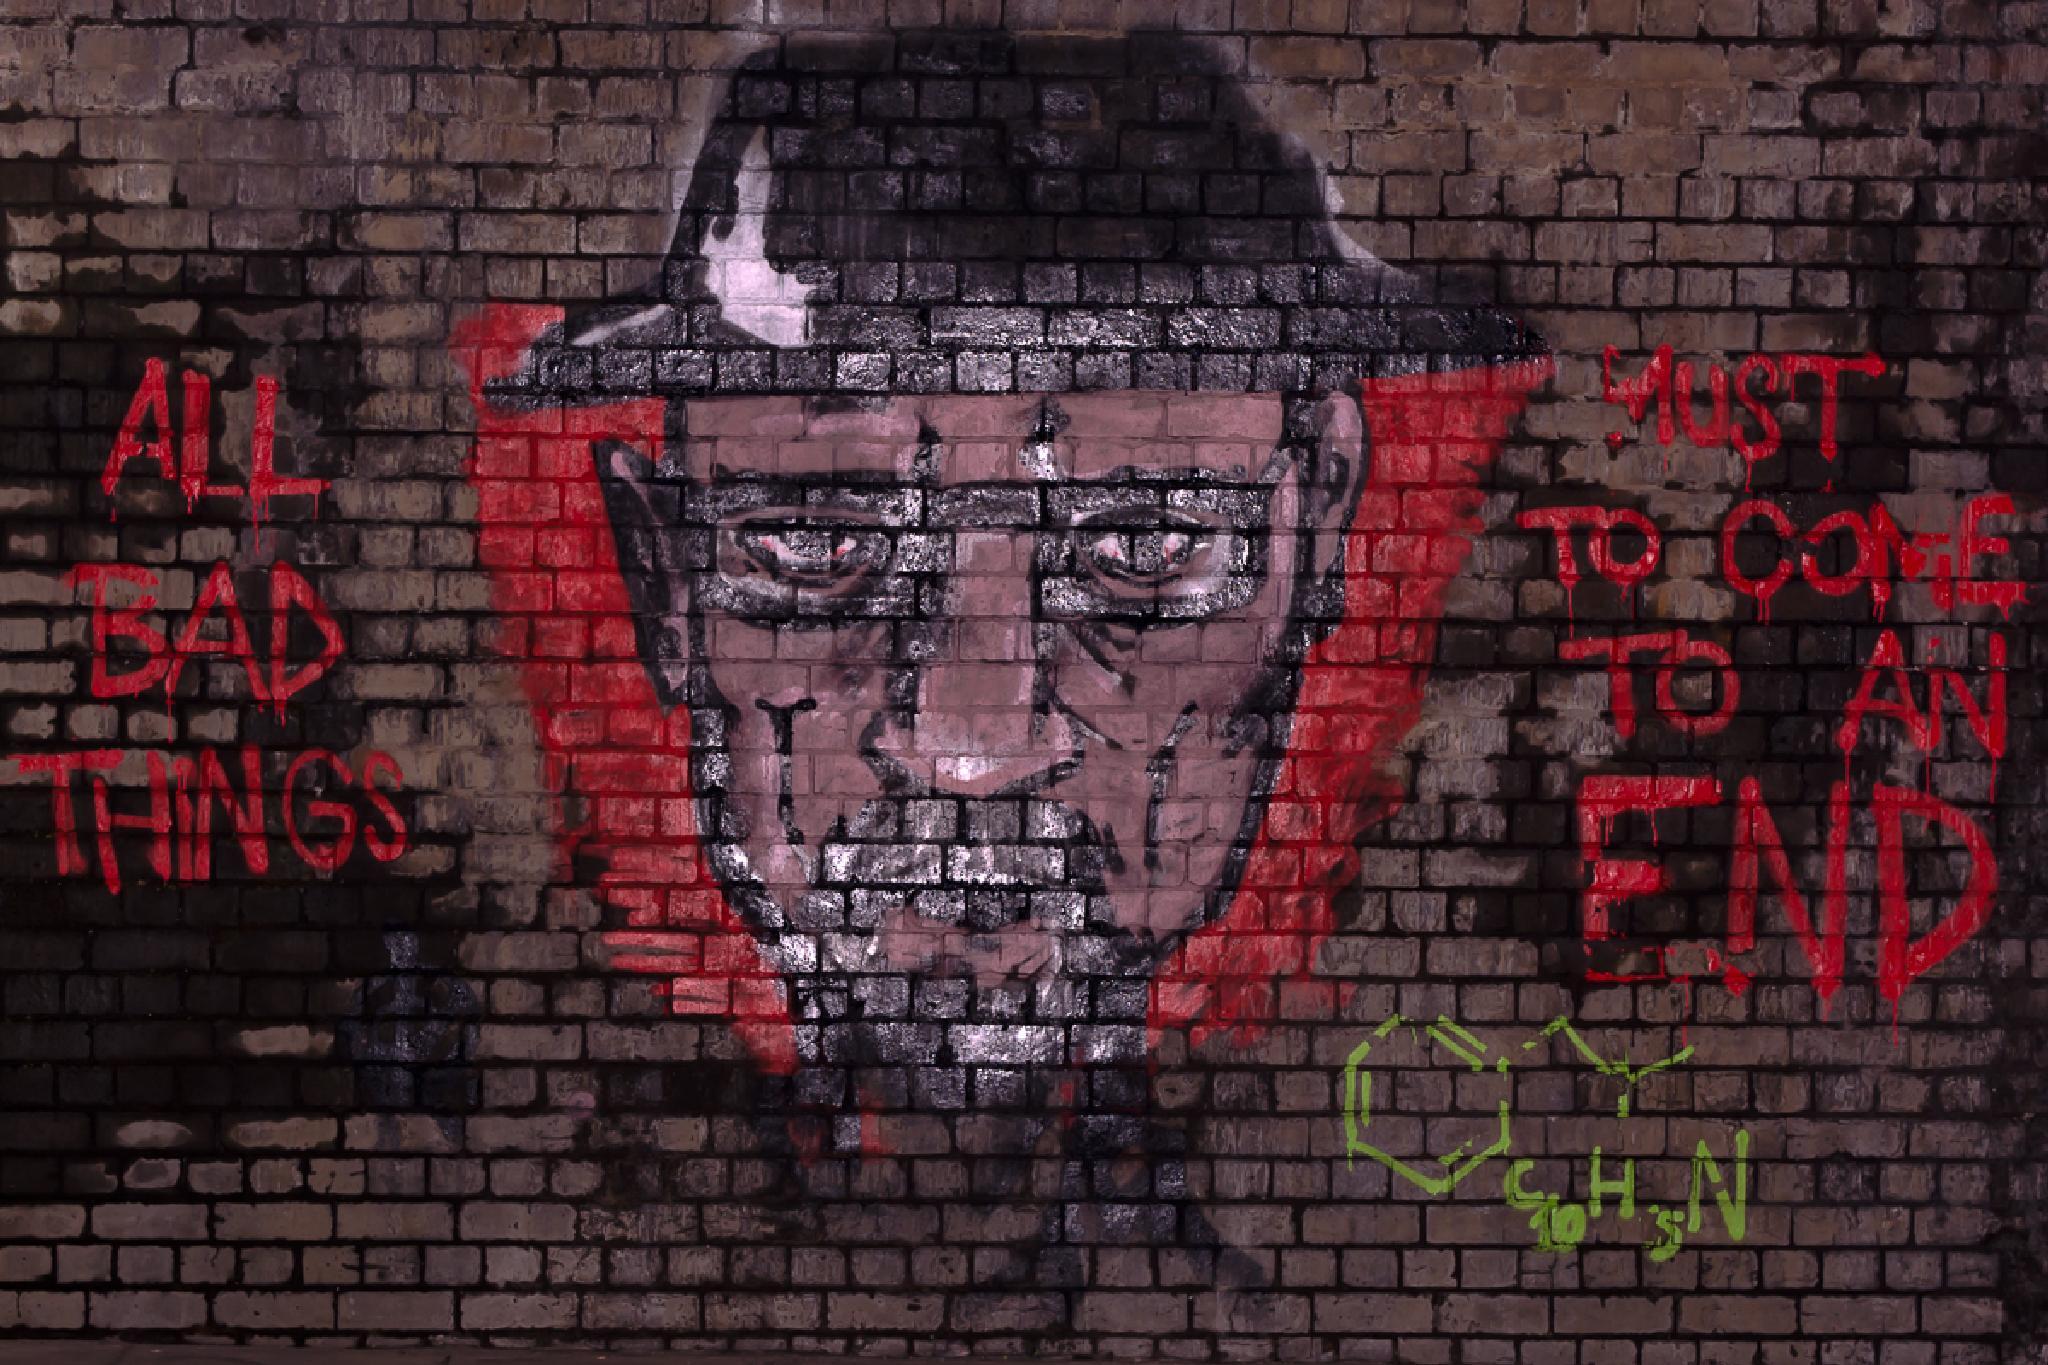 Graffiti by David Foster Barnes